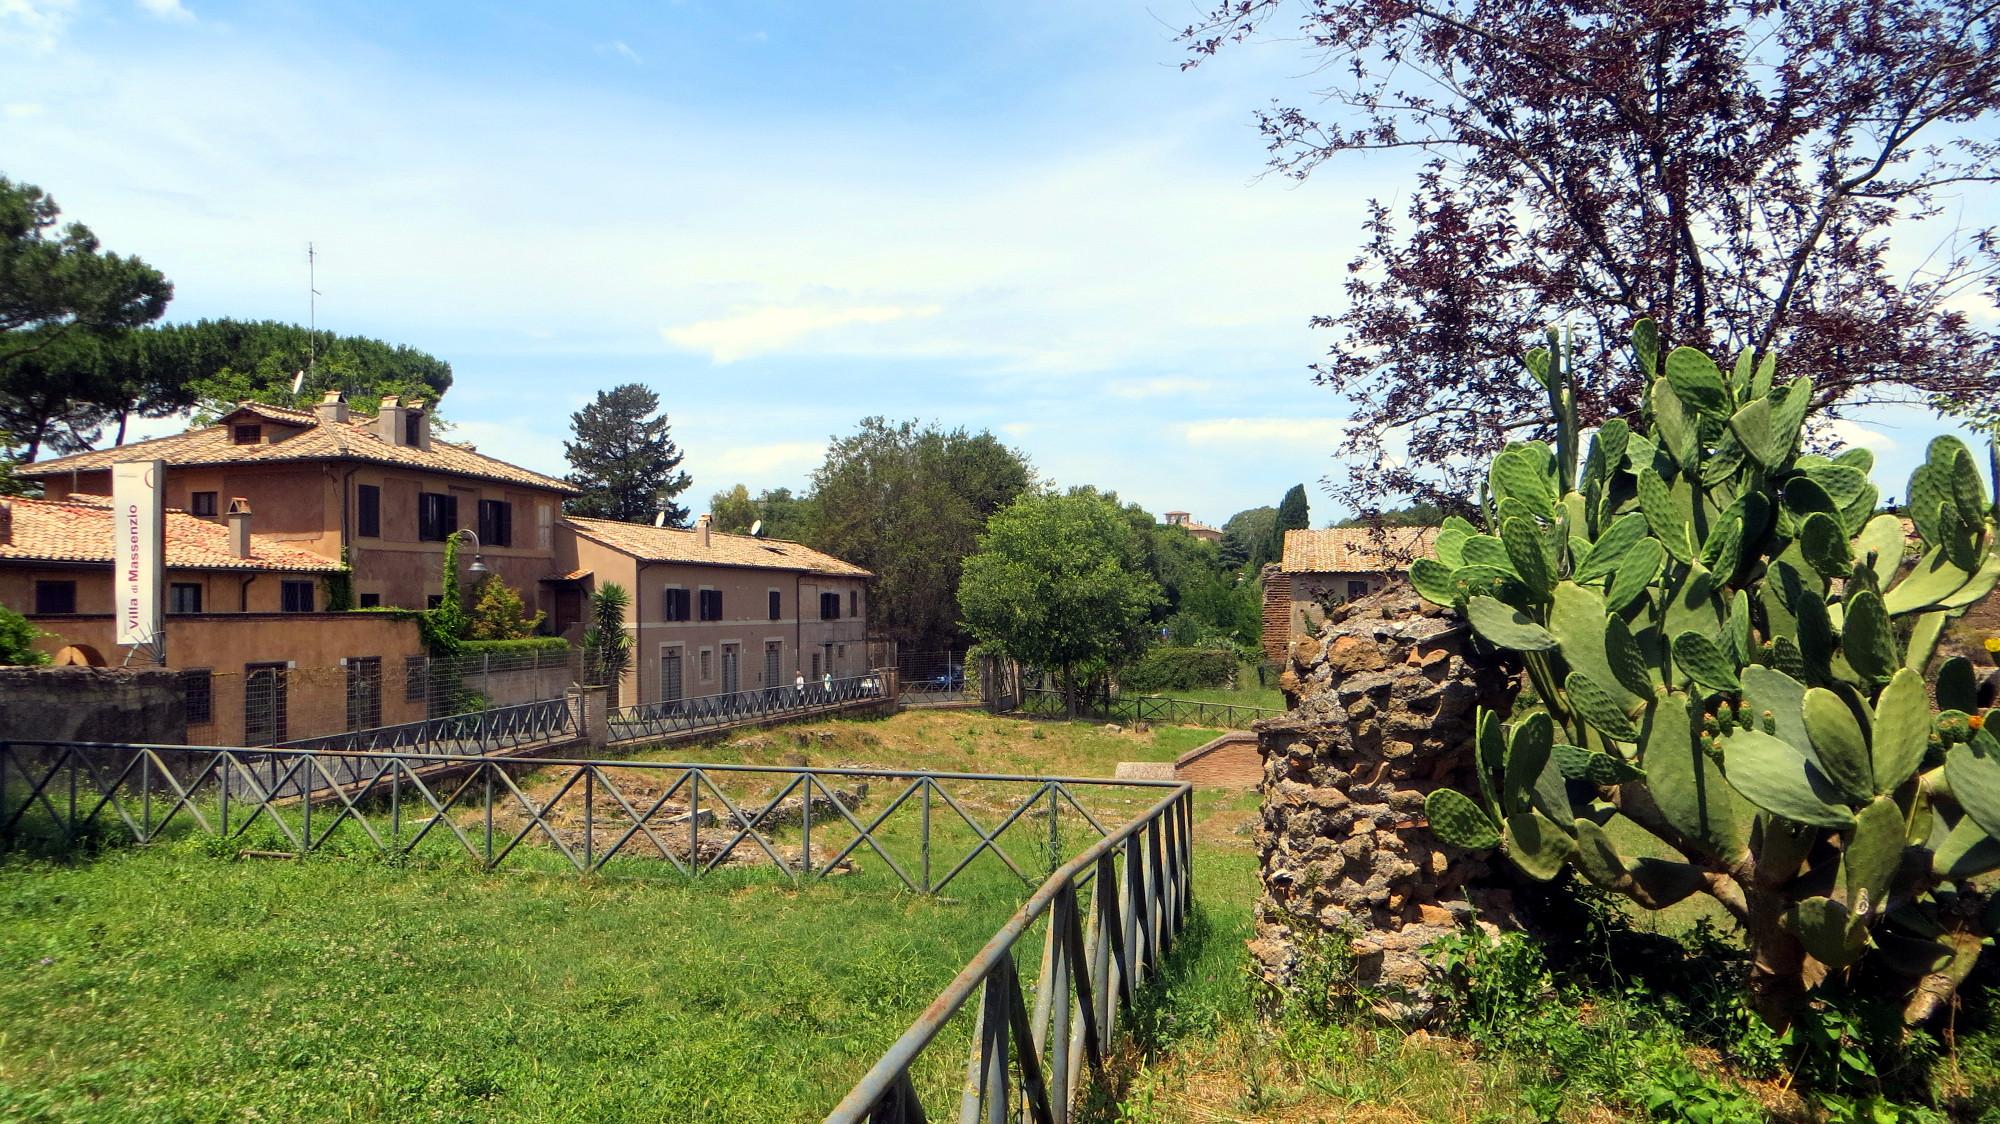 Die Maxentiusvilla auf der Via Appia Antica in Rom